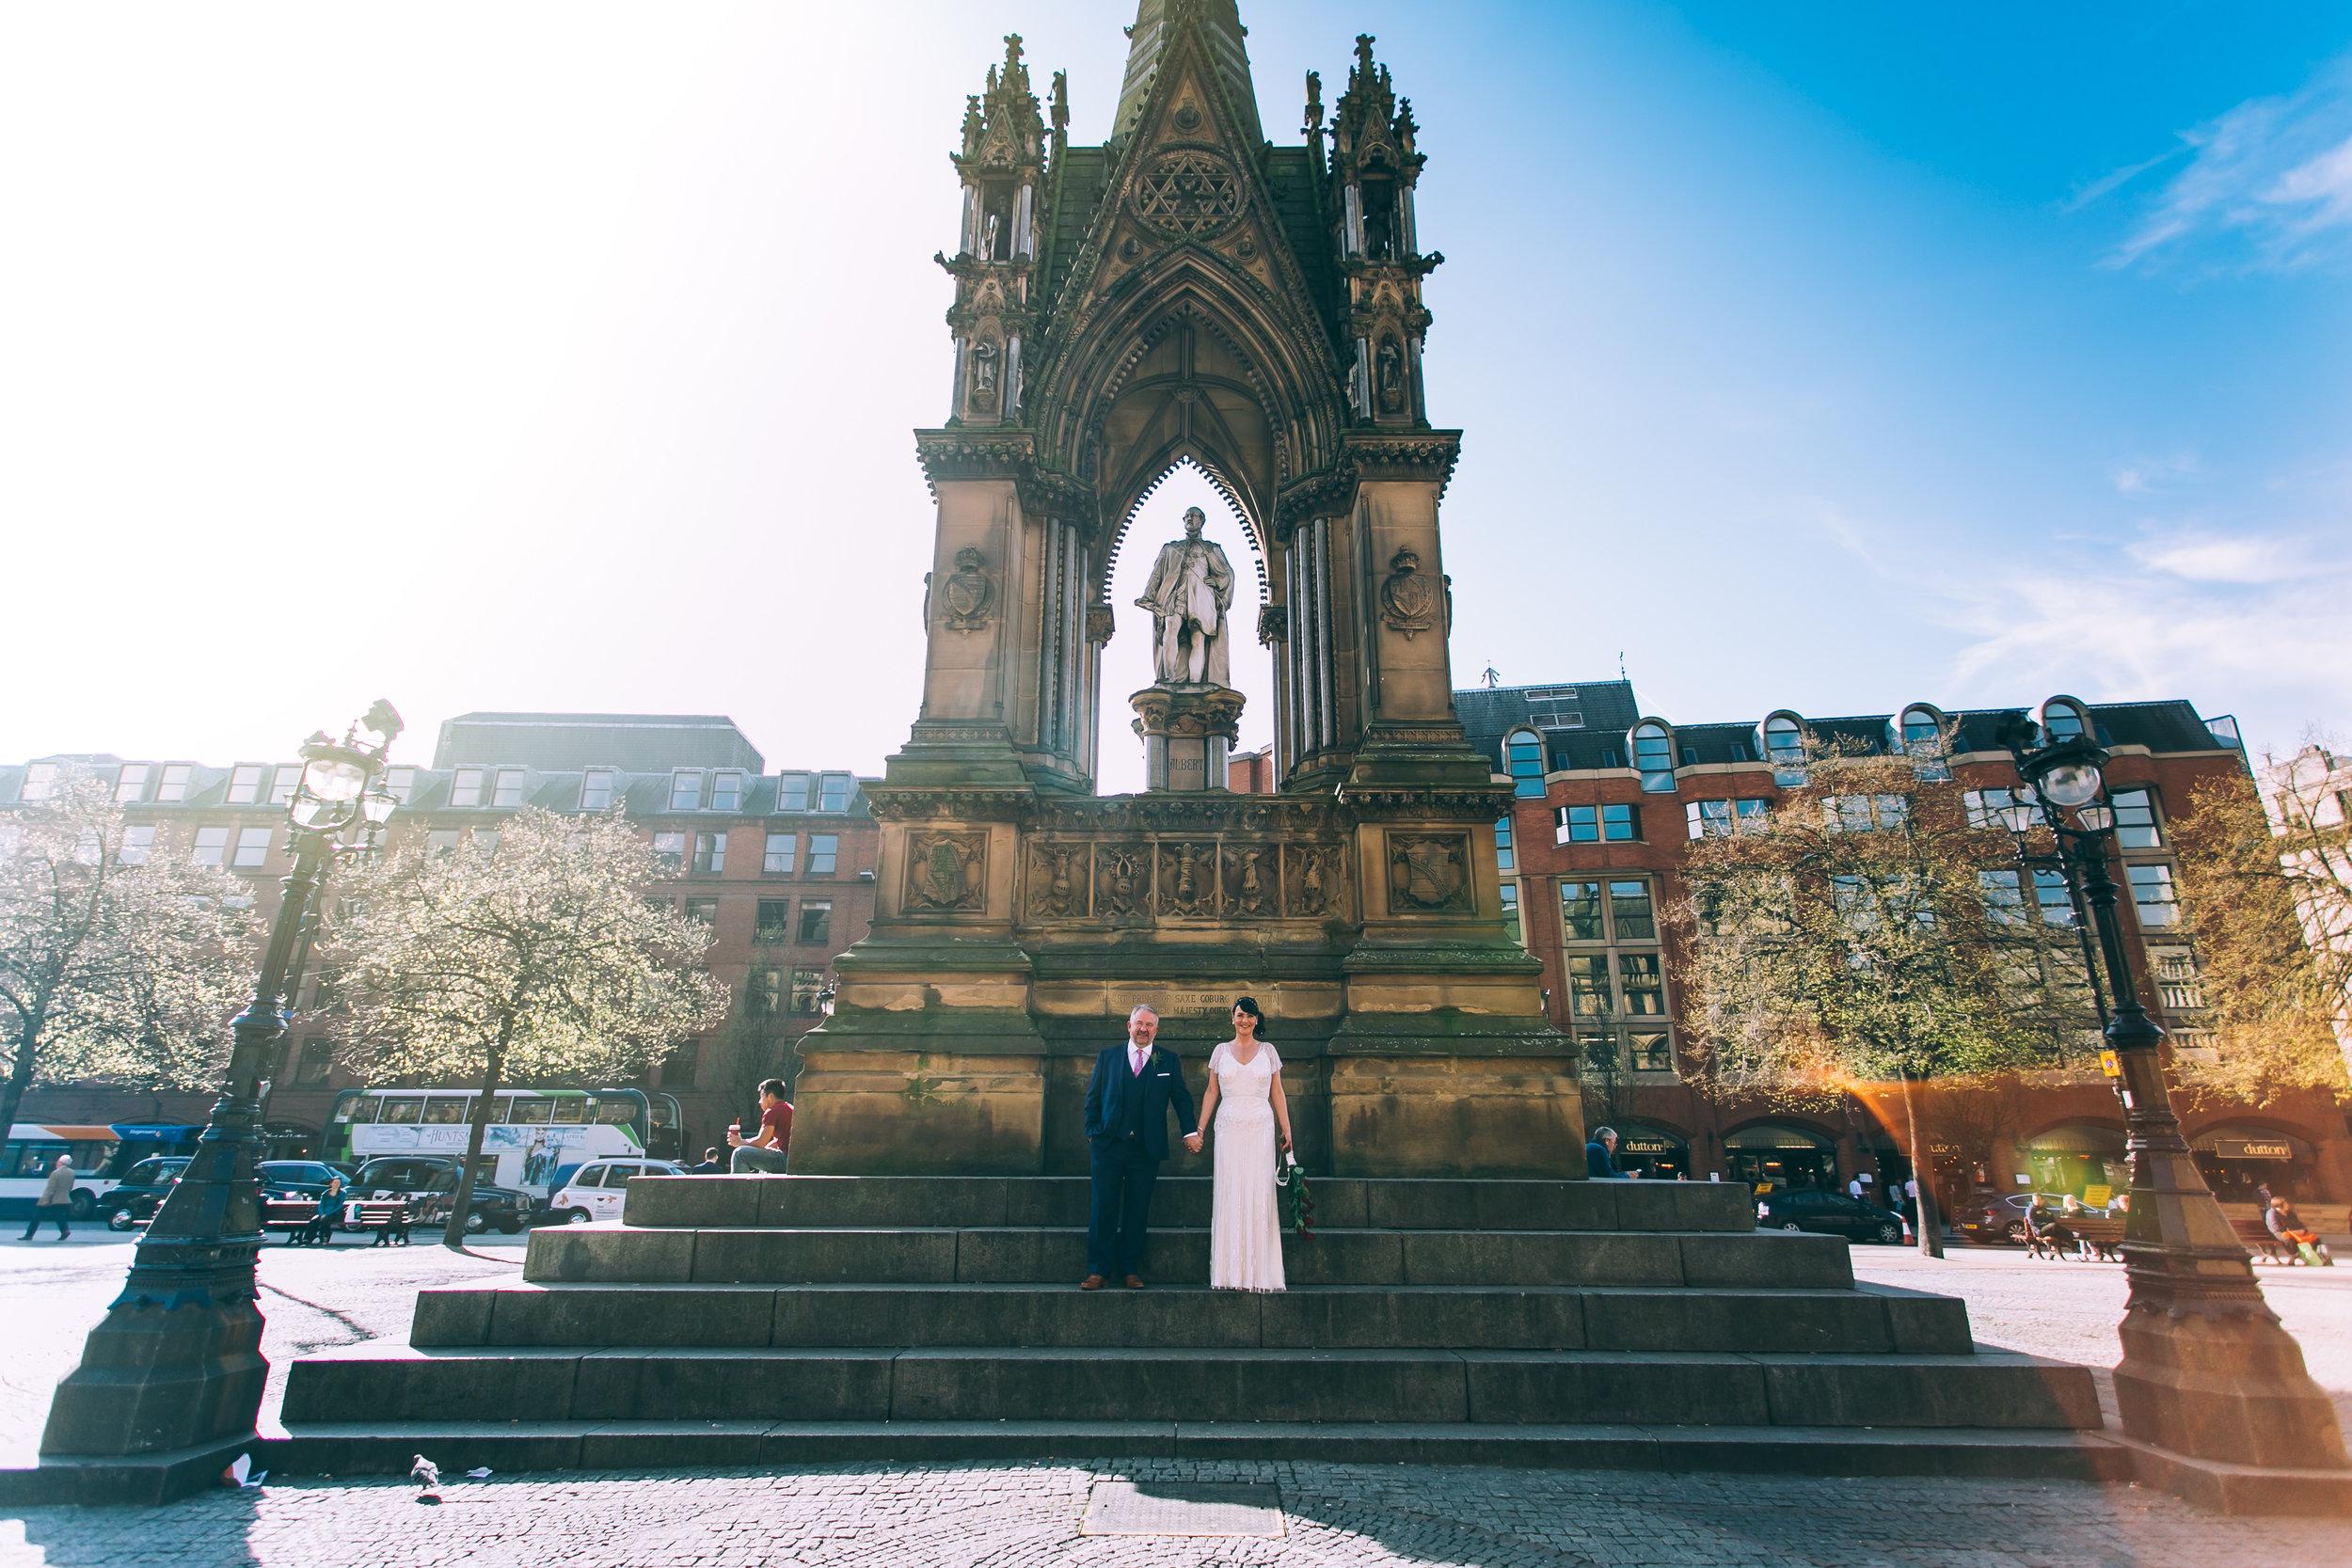 JayneandJohn-Wedding-at-Manchester-town-hall-manchetser-house-tom-biddle-tb179.jpg